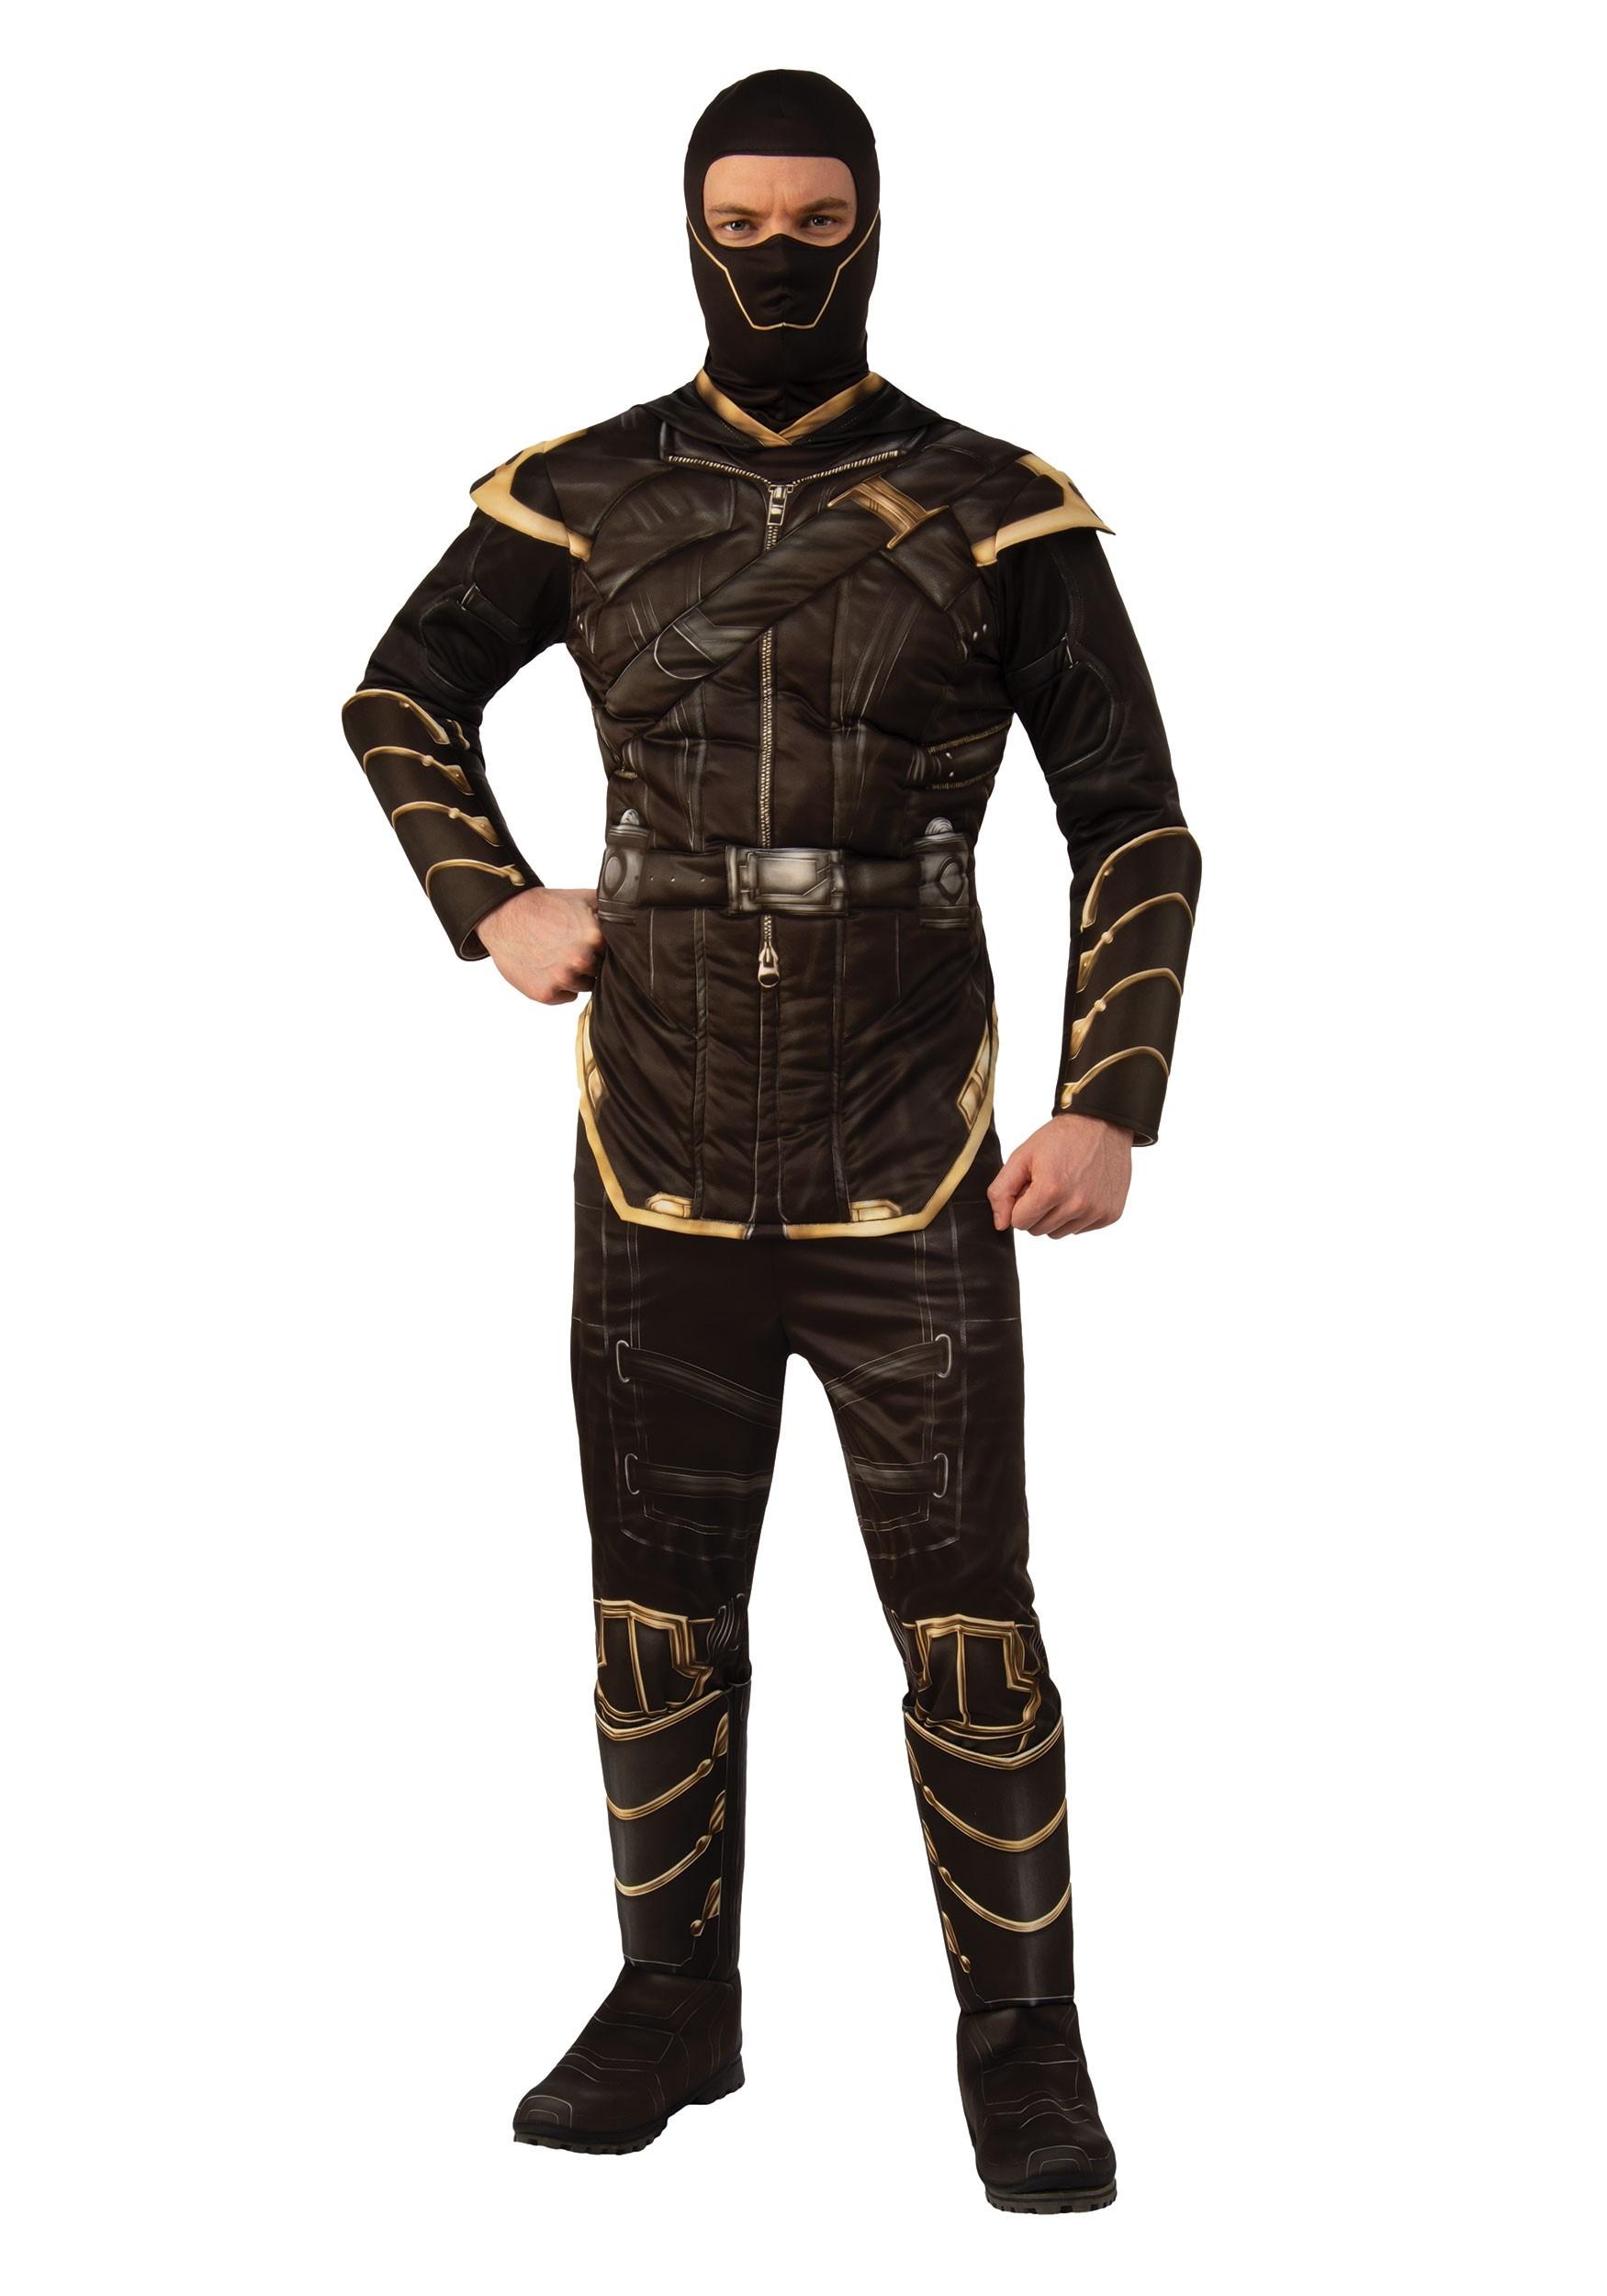 Hawkeye Ronin Avengers Endgame Adult Costume